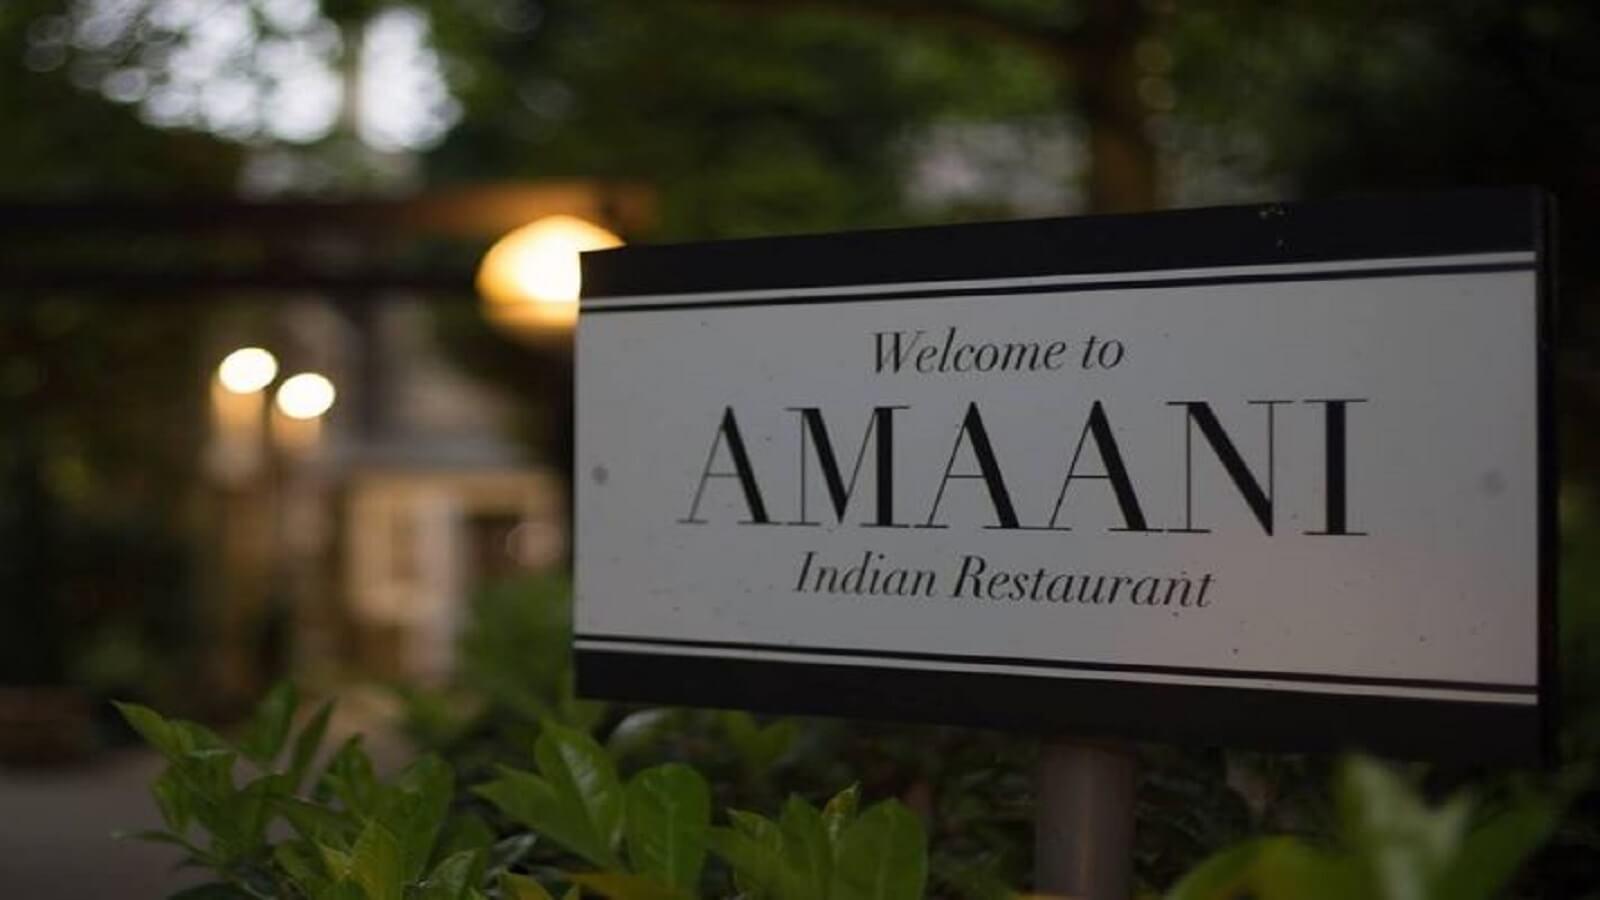 Amaani